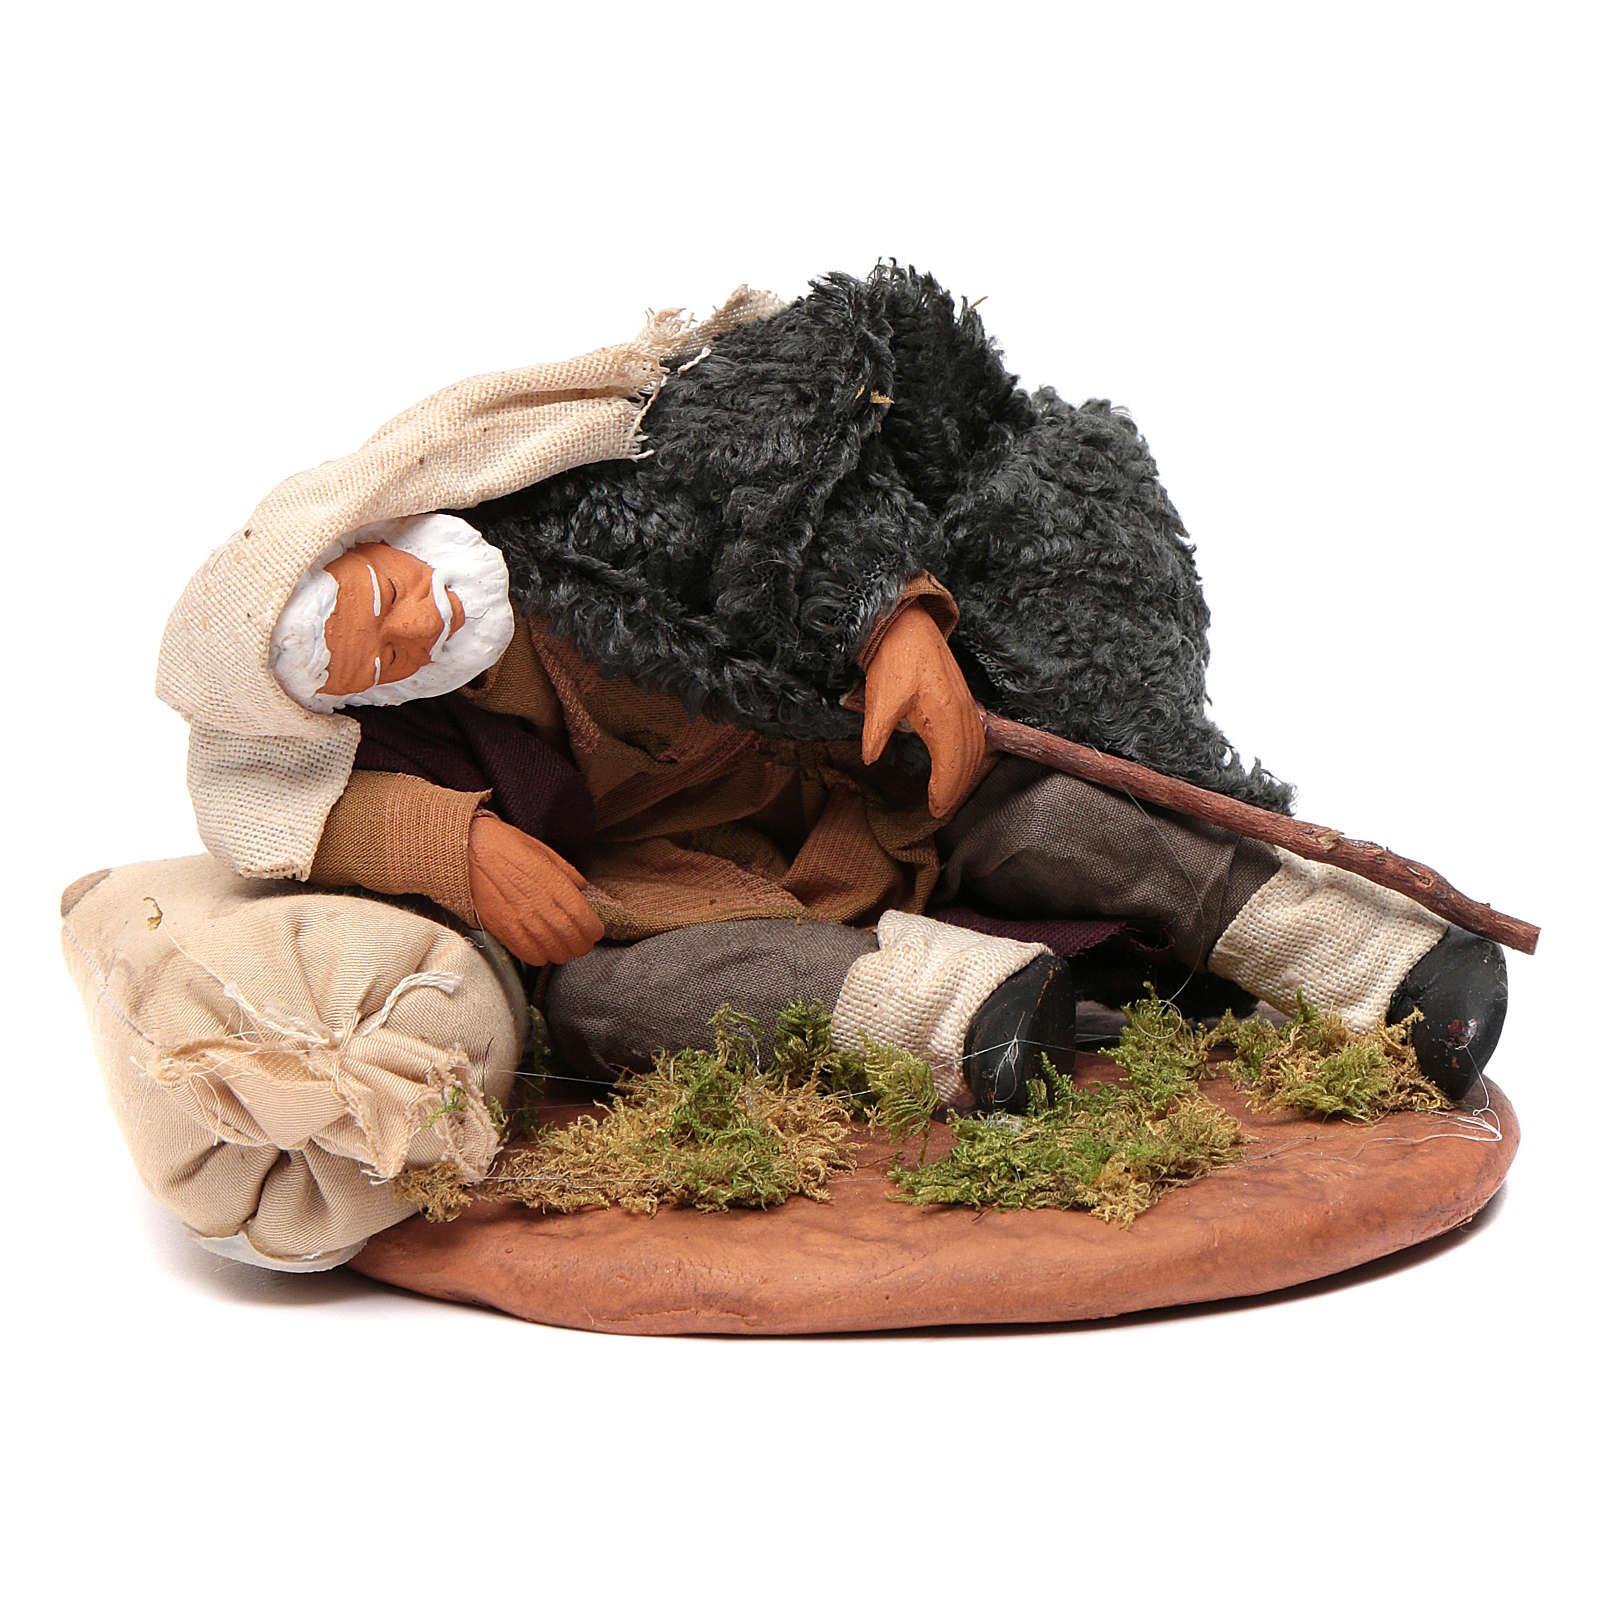 Nativity set accessory man asleep 14 cm figurine 4